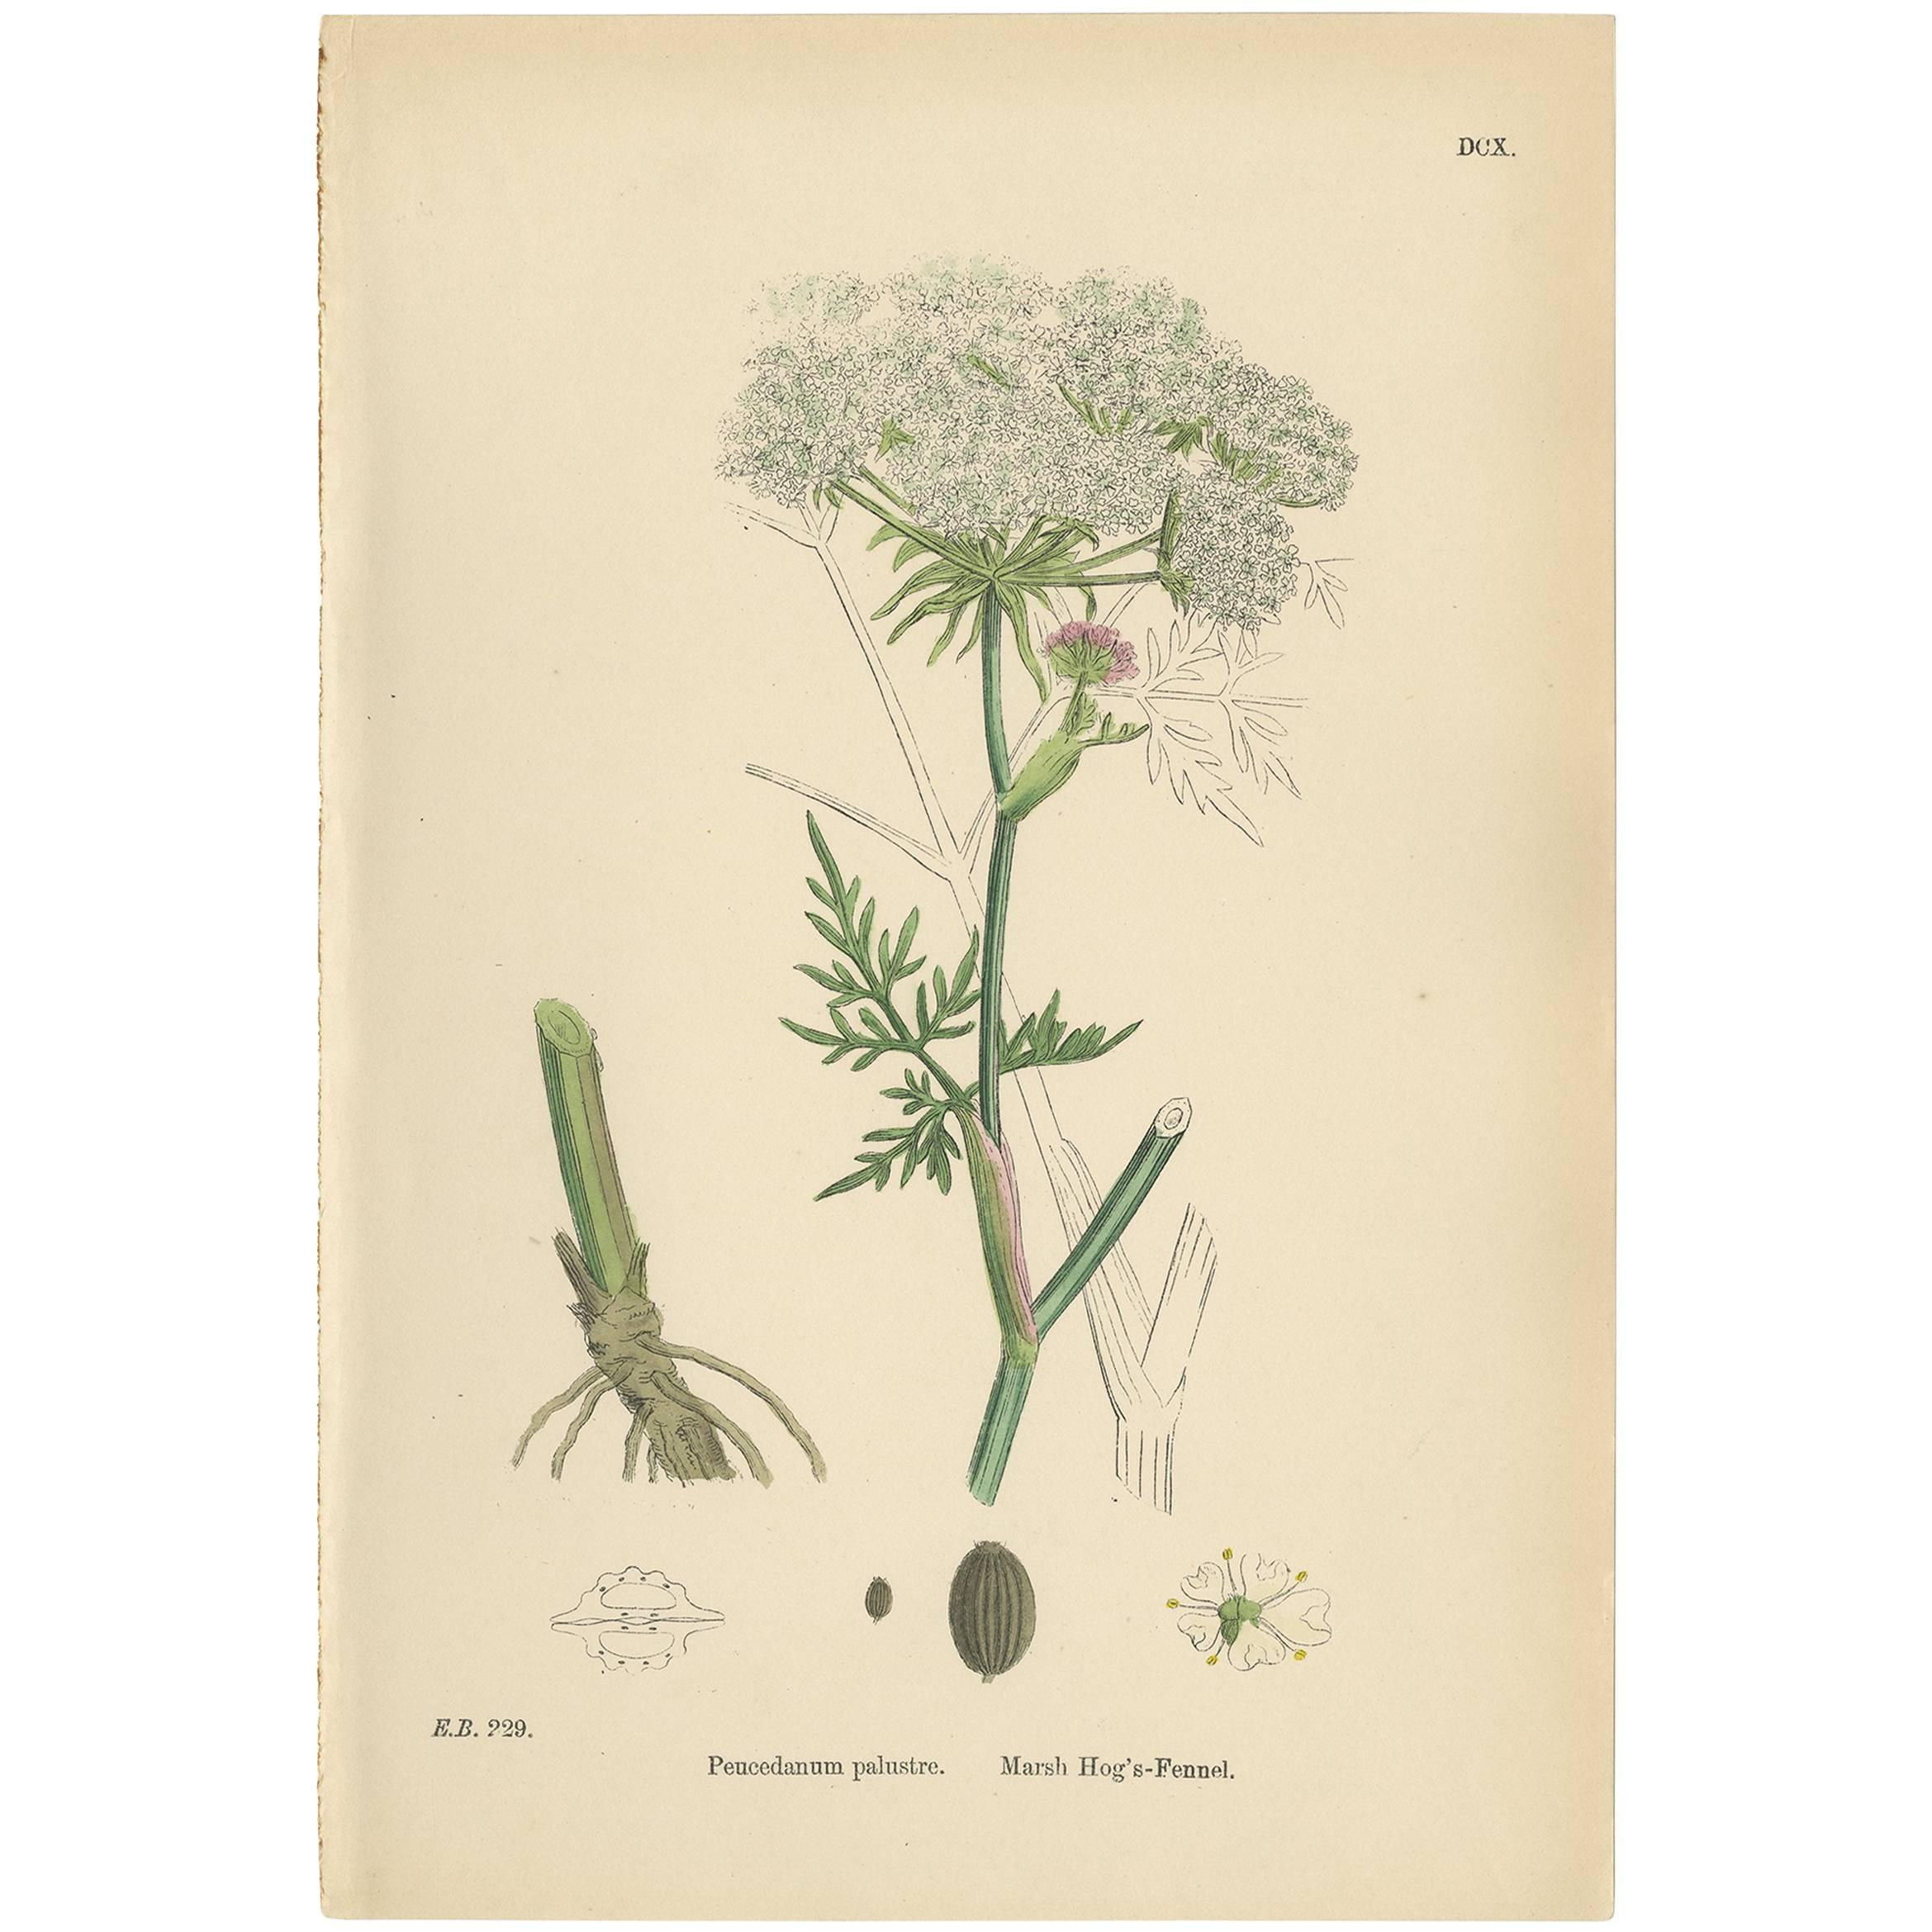 Antique Botany Print 'Marsh Hog's-Fennel' by J. Sowerby, circa 1860